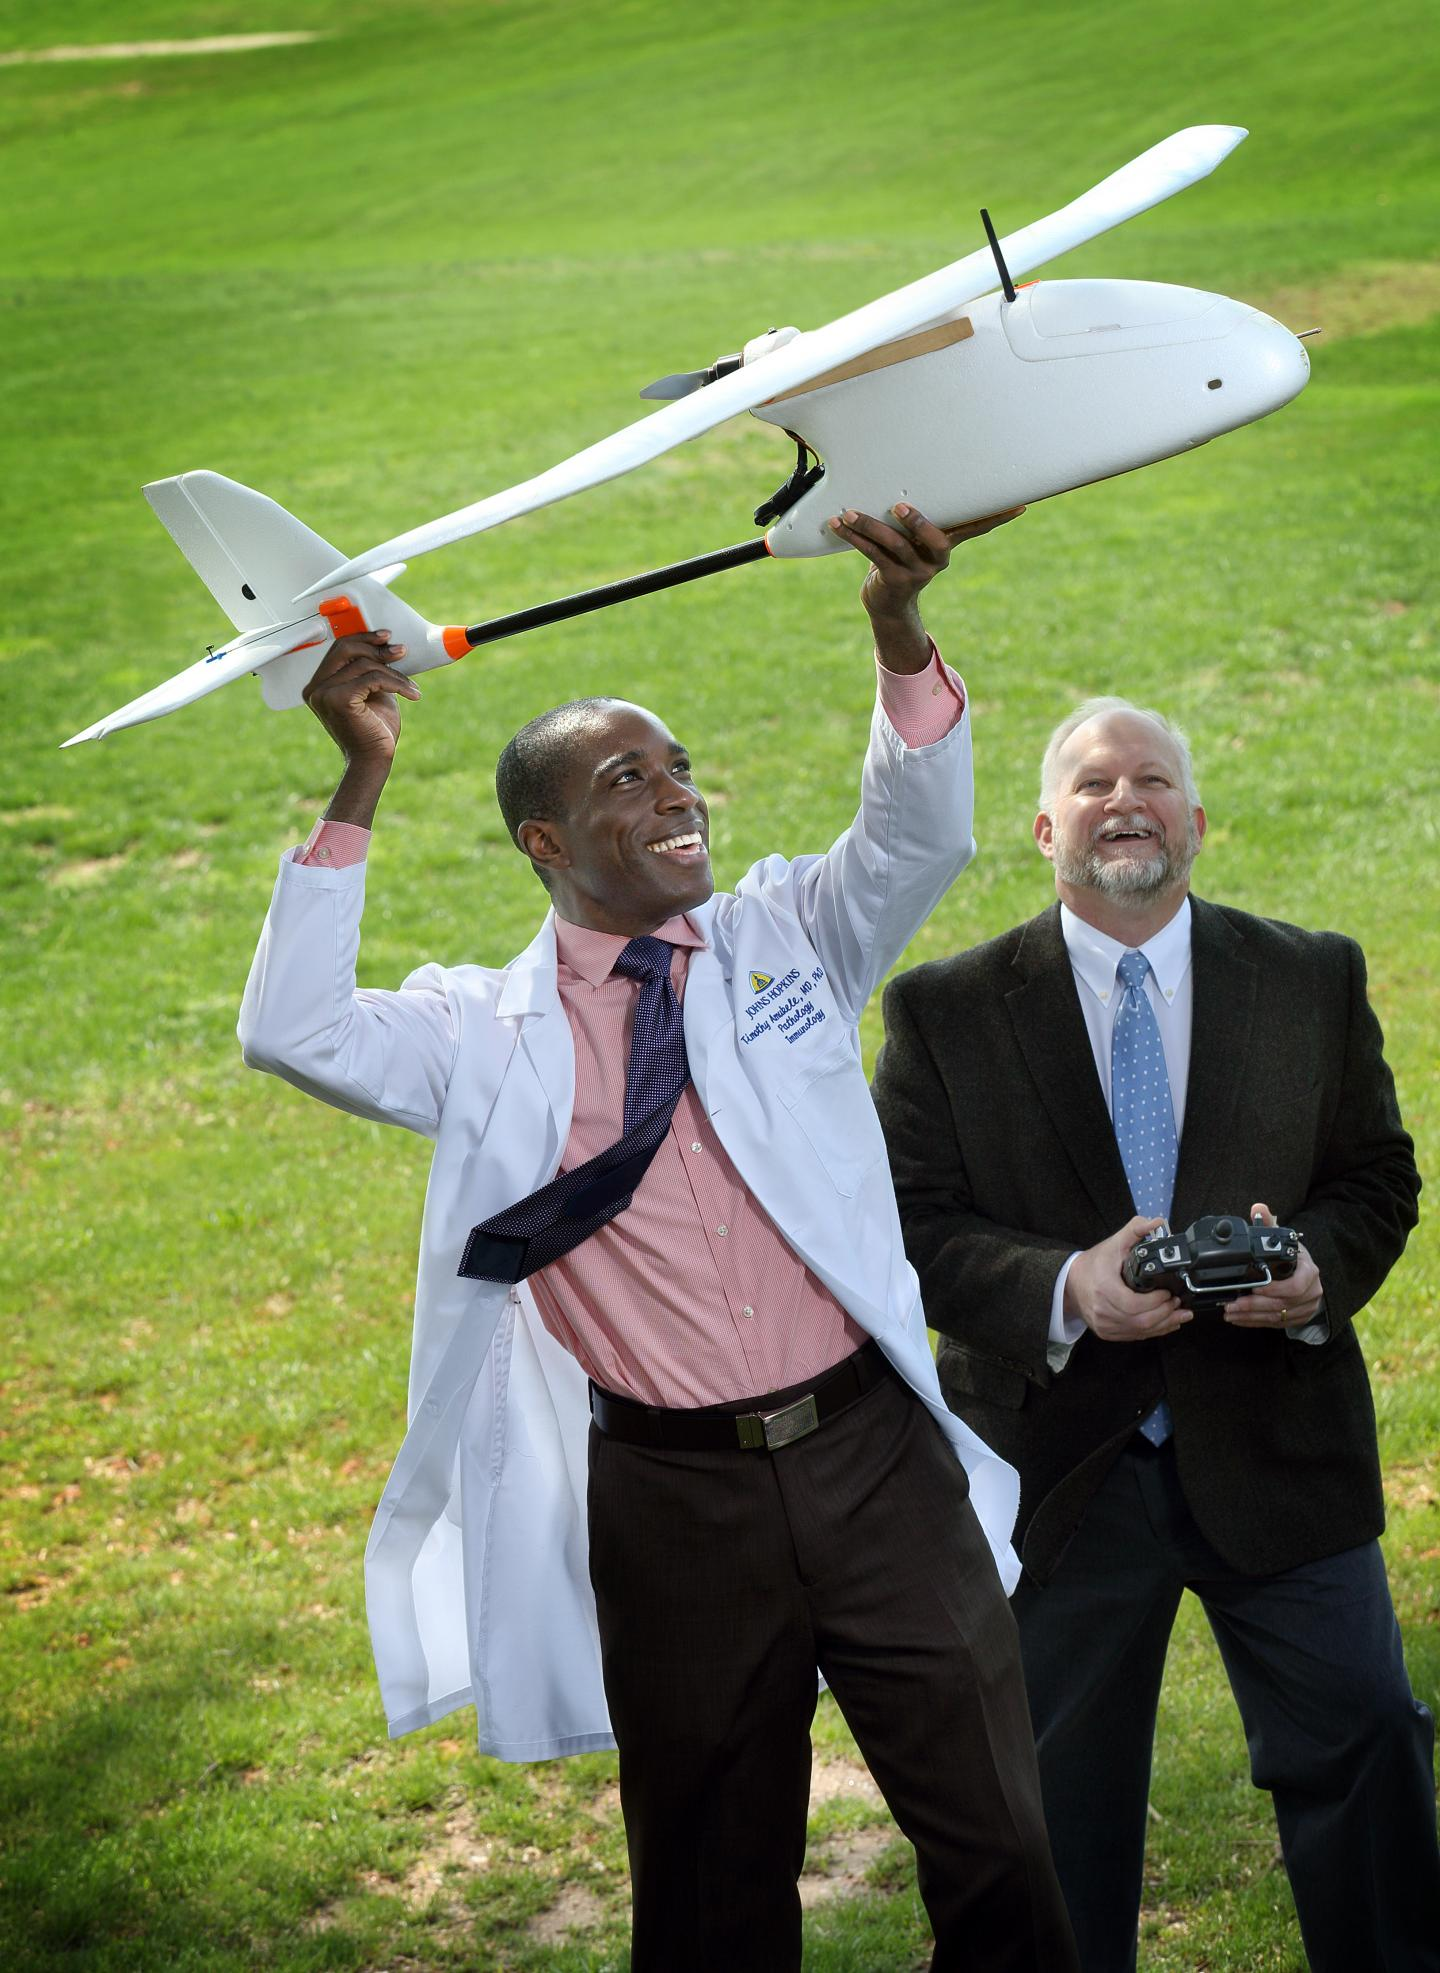 Timothy Amukele and Robert Chalmers, Johns Hopkins Medicine